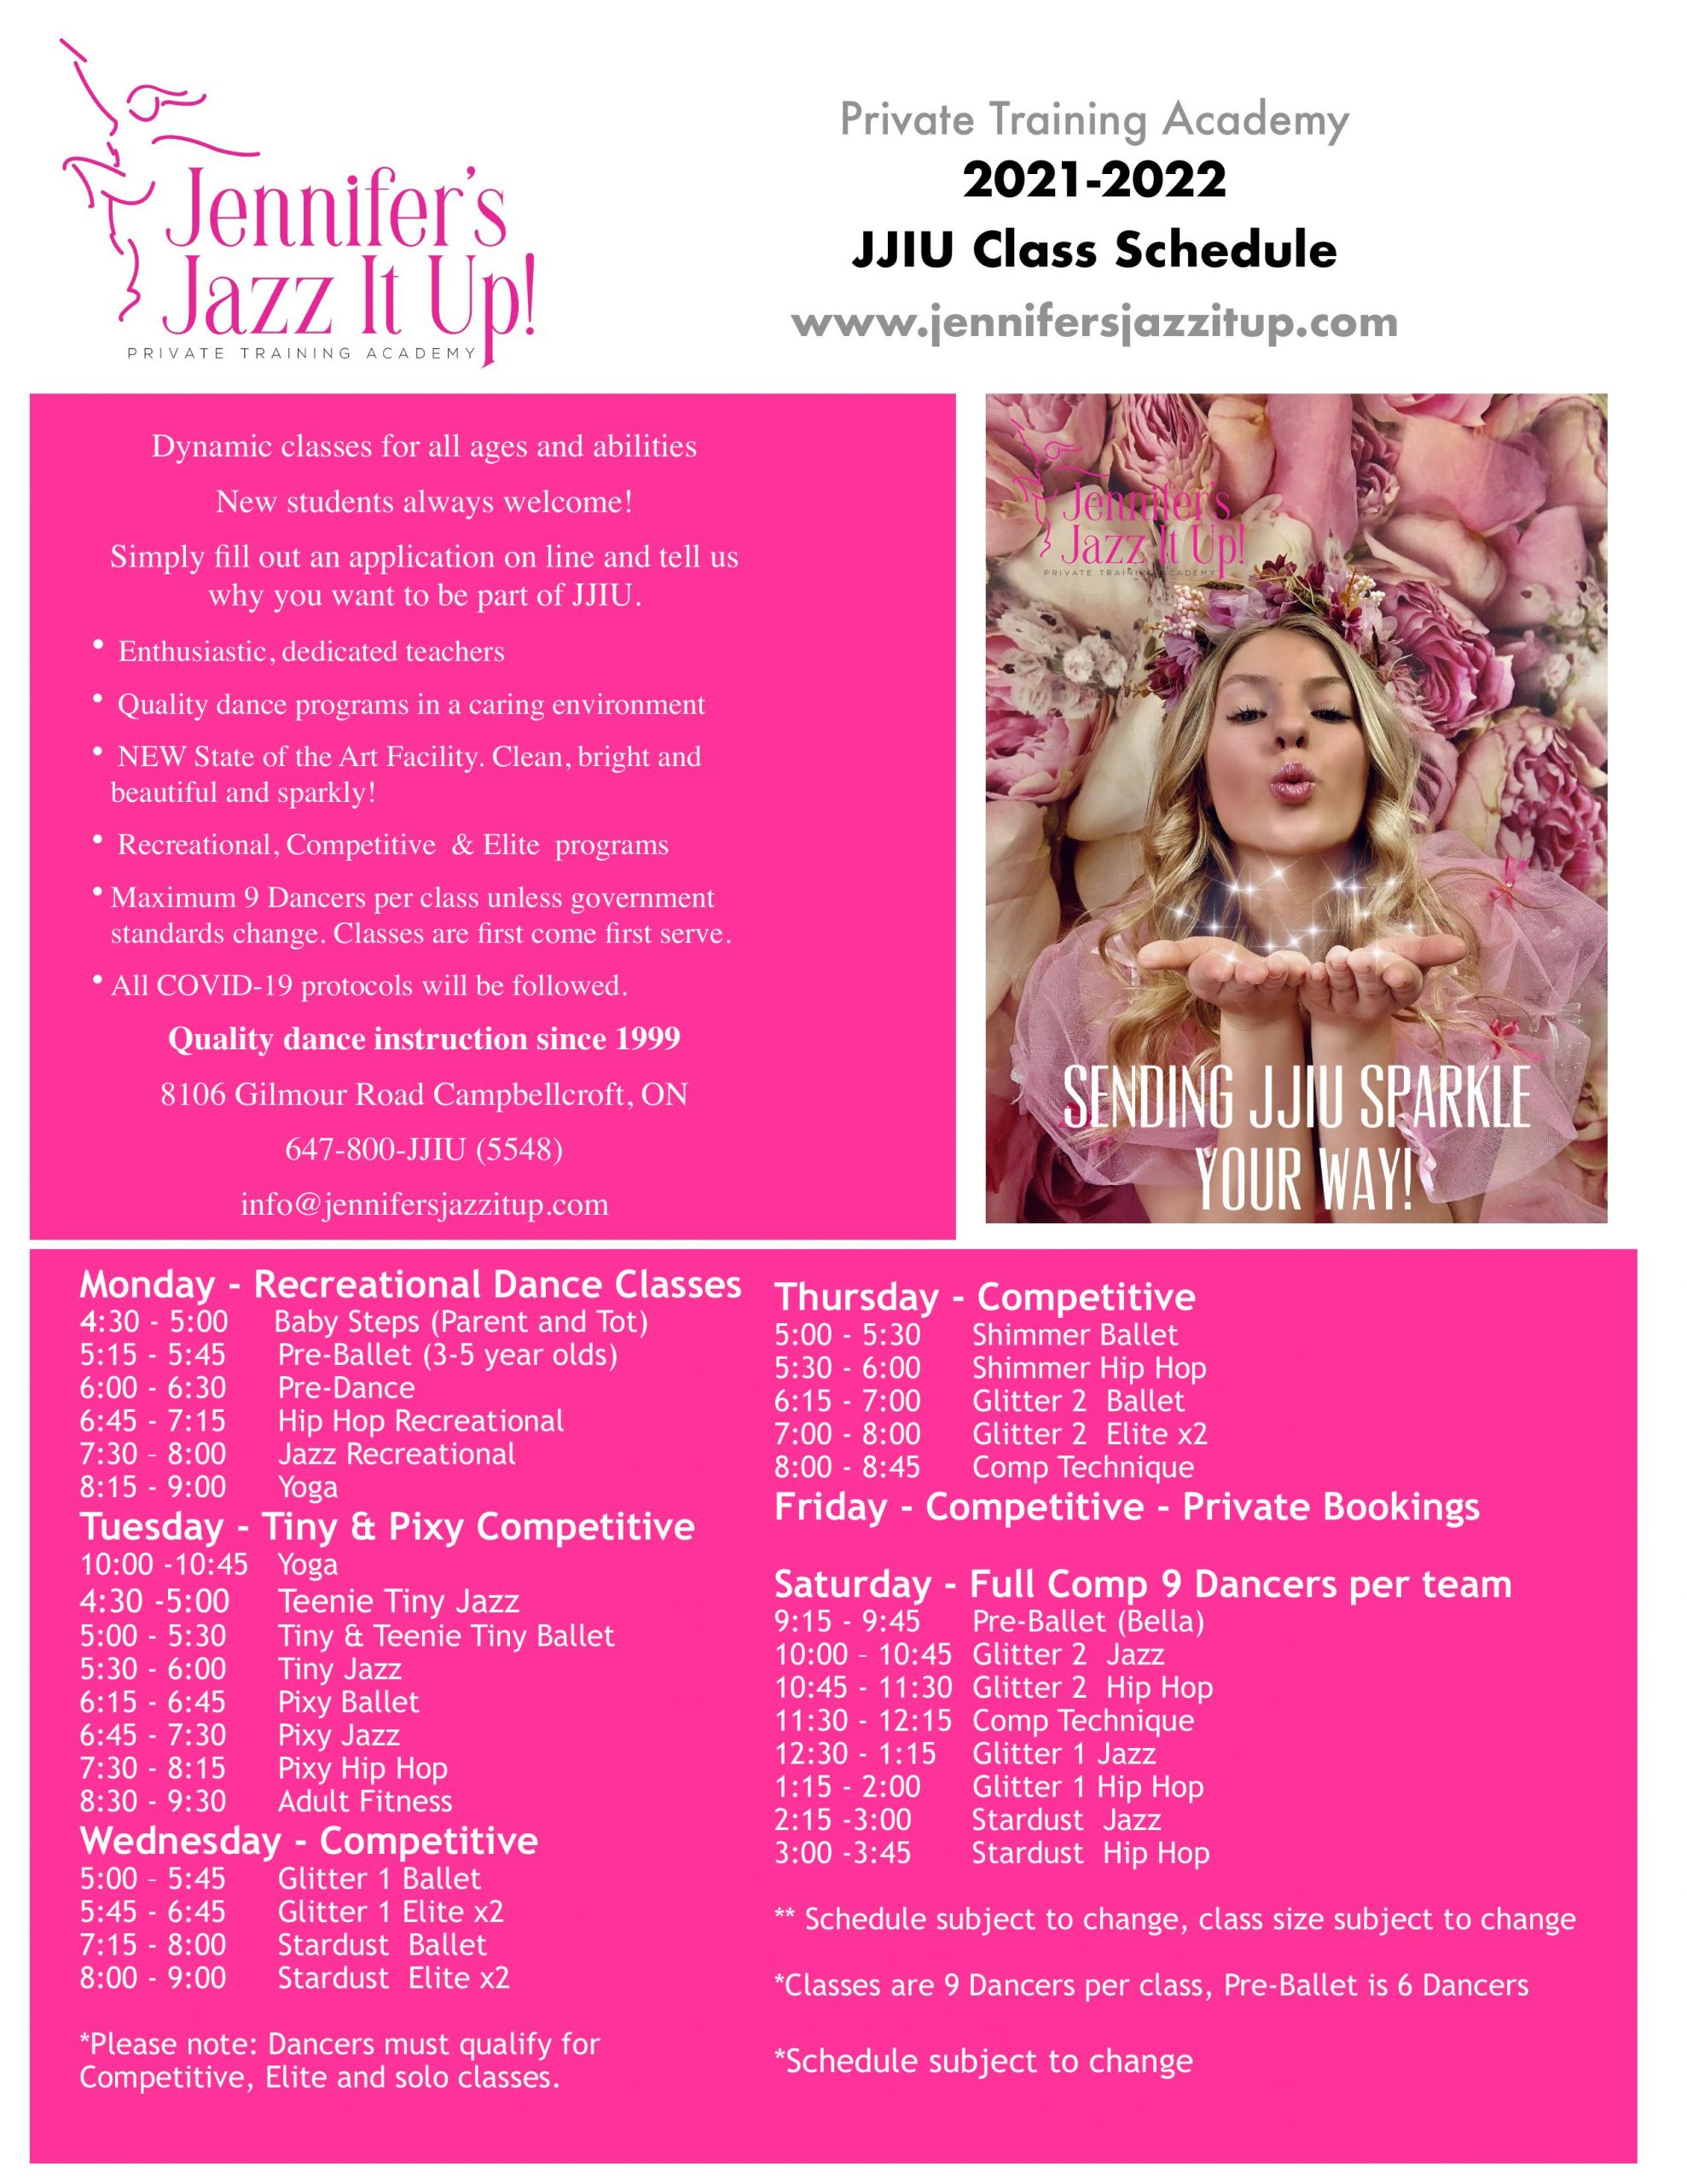 jennifer's jazz it up studio of dance in Port hope and cobourg class schedule